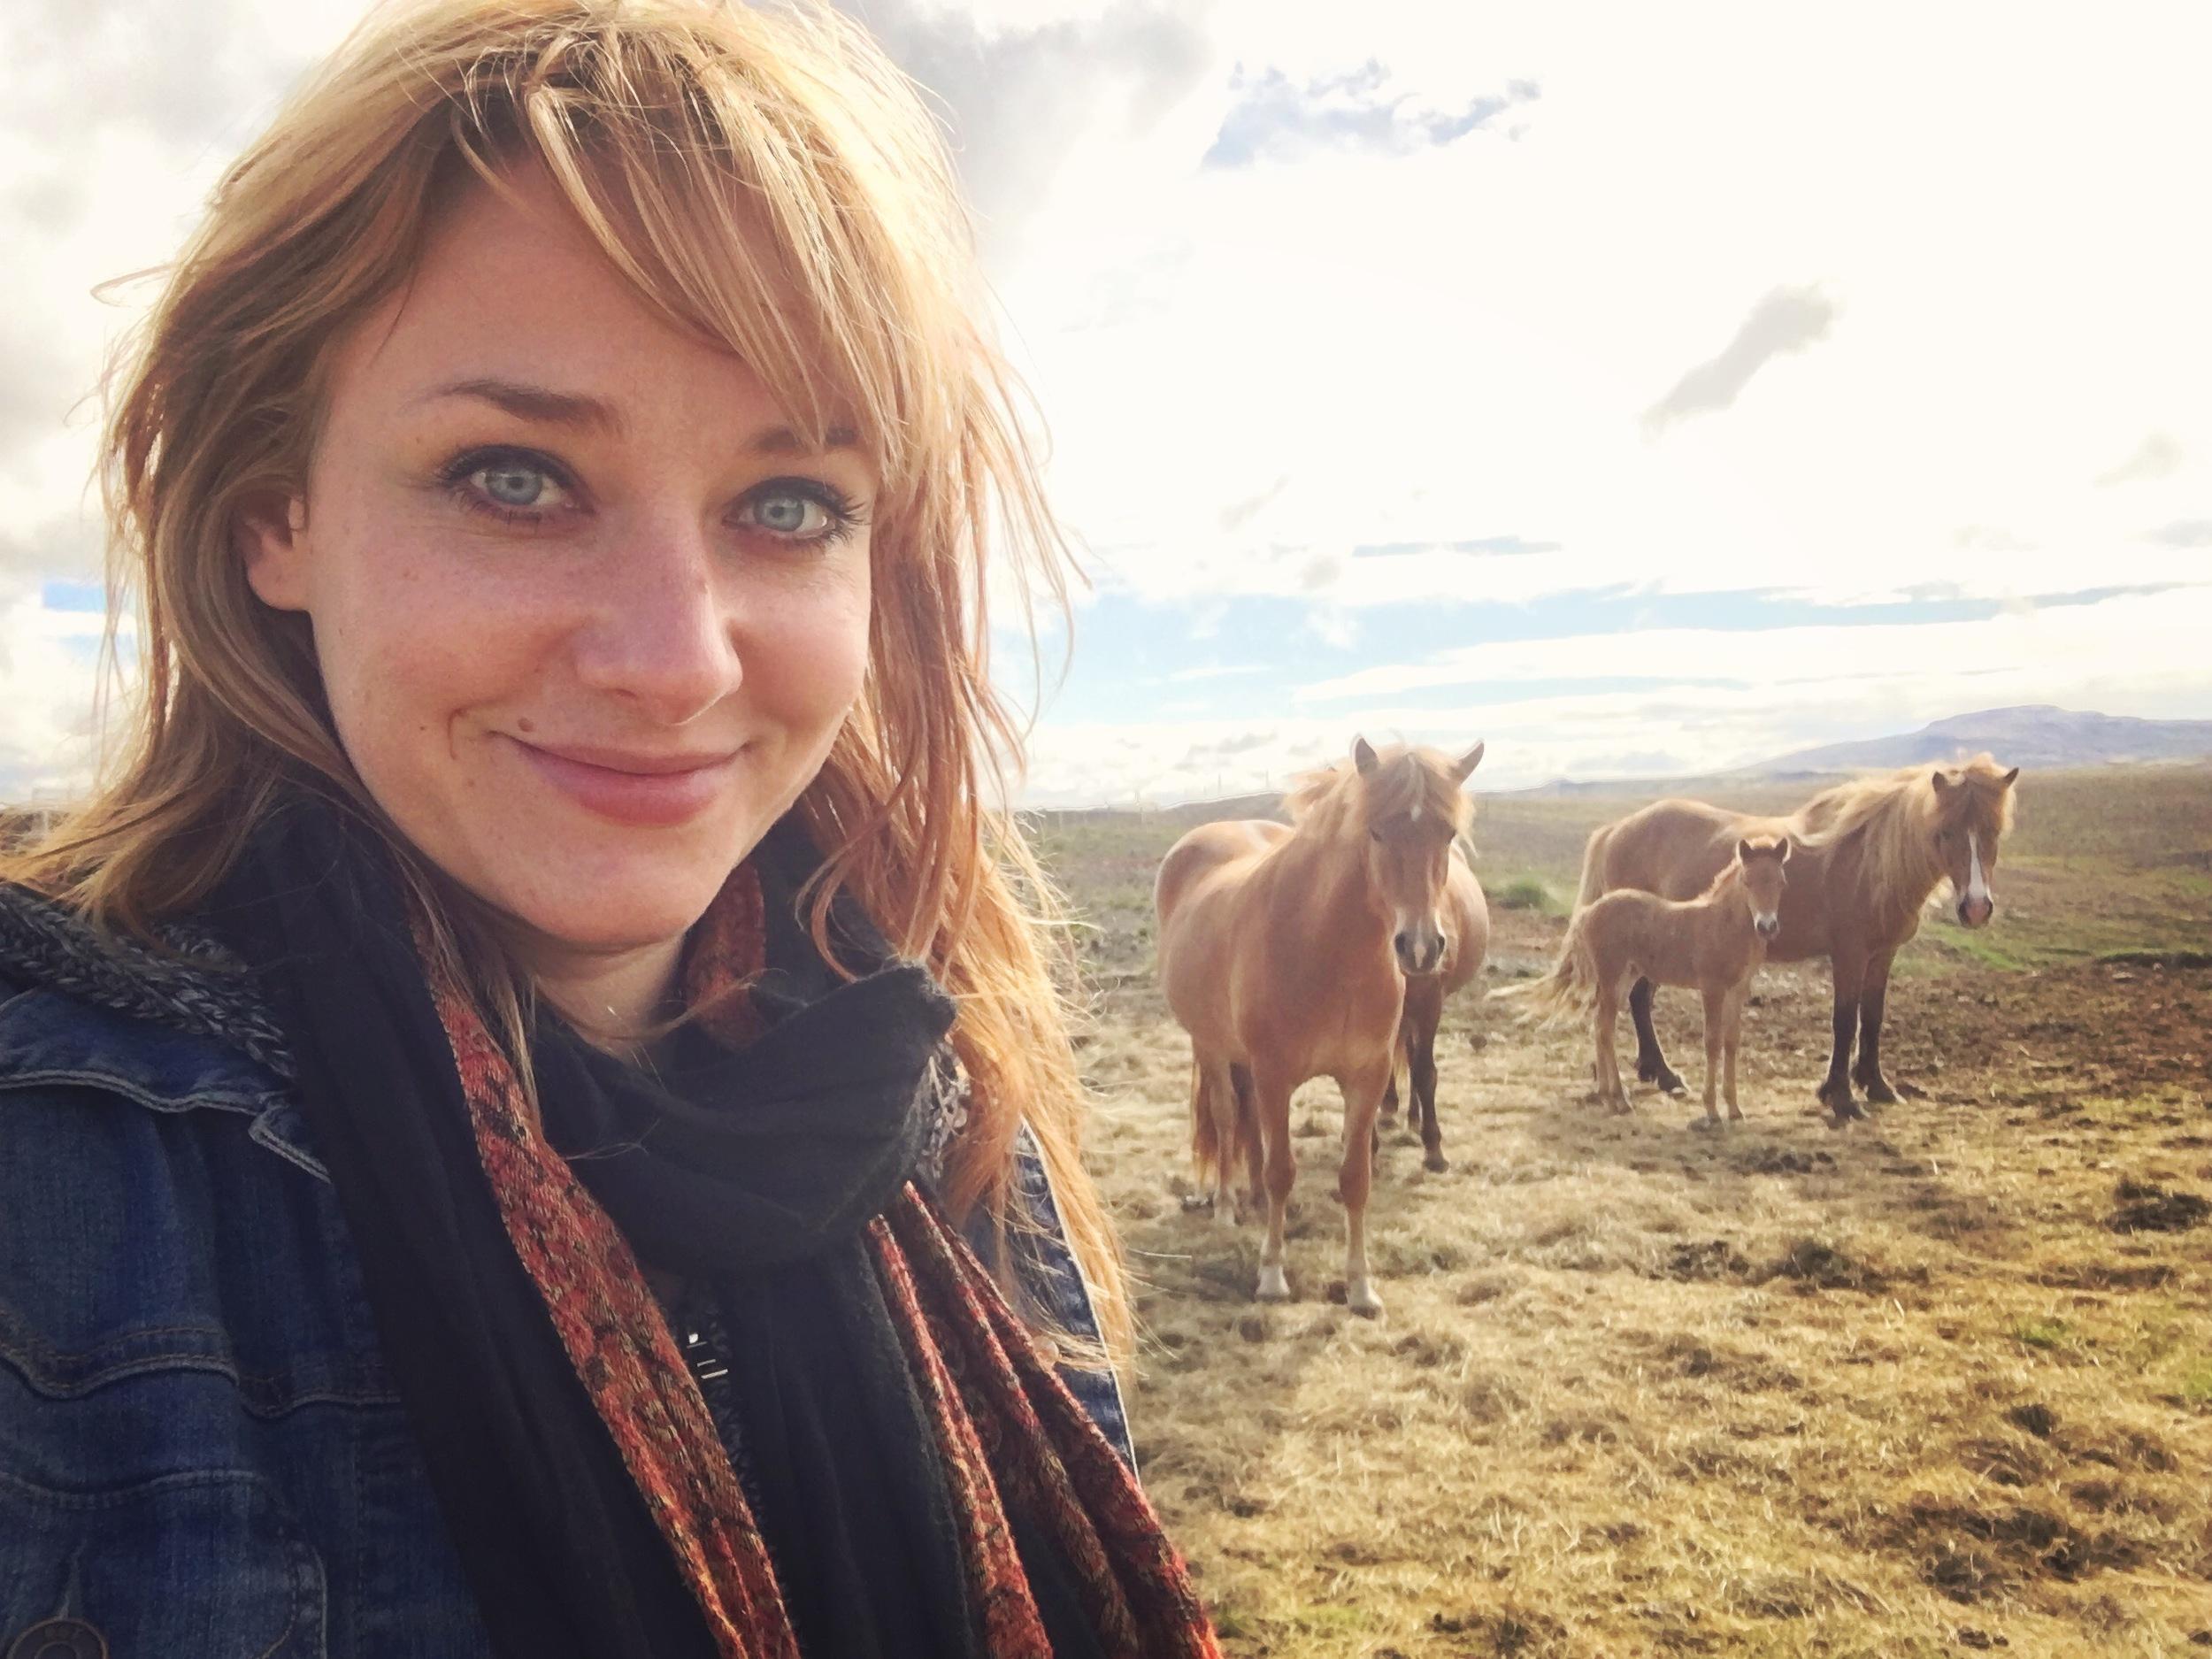 Icelandic horses w Boston headshot photographer Erica Derrickson